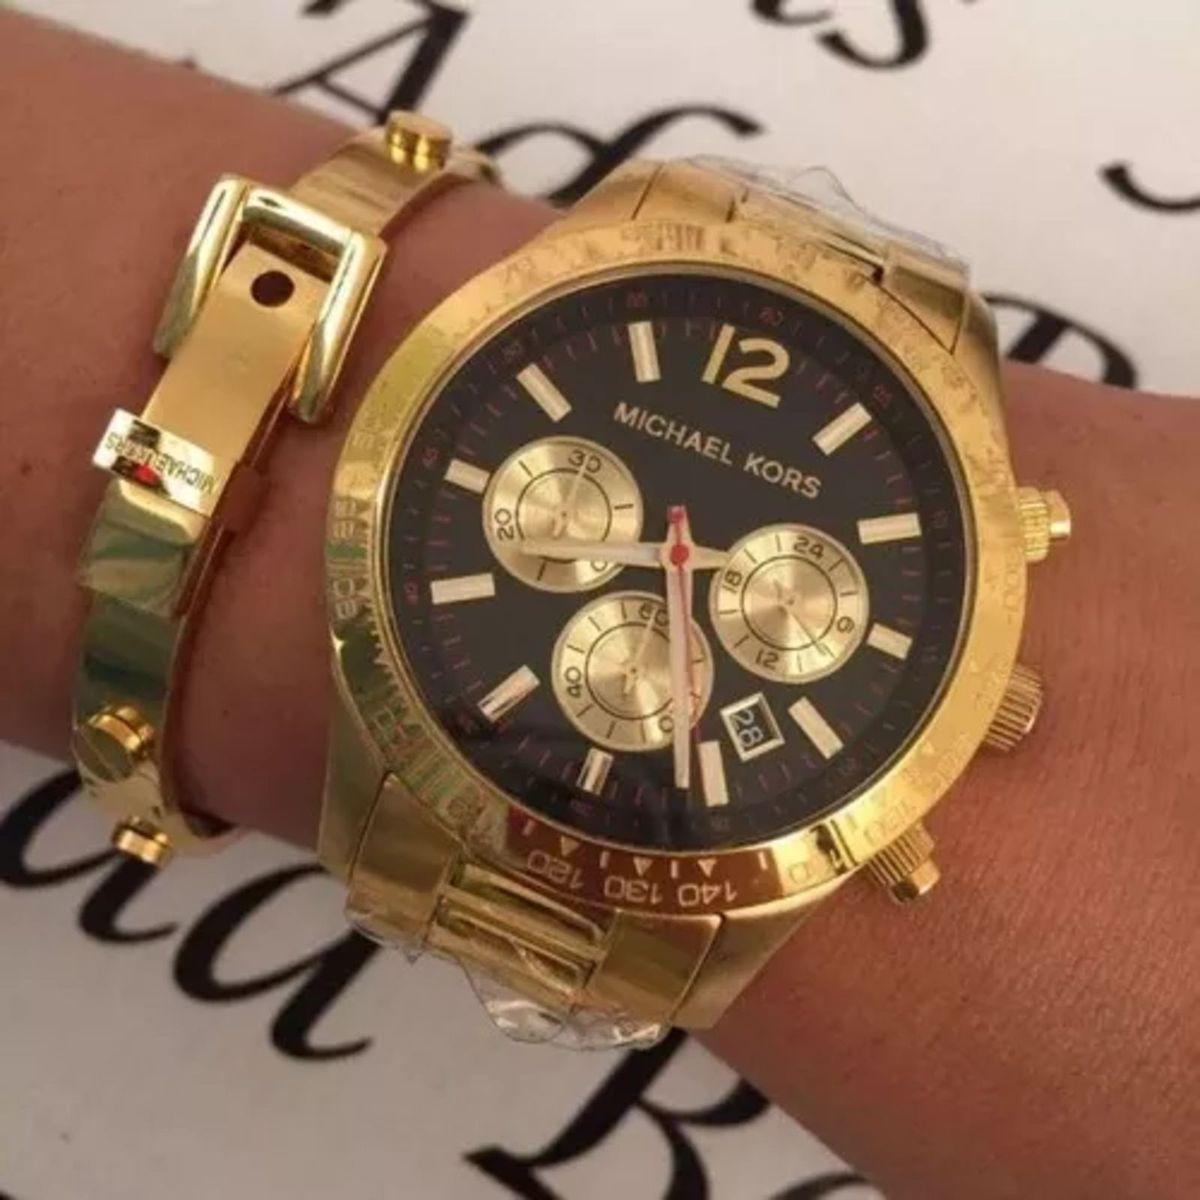 566090accb6df Relógio Ck3161 Feminino Michael Kors Mk8214 Dourado Grande Caixa e Manual  Jey38